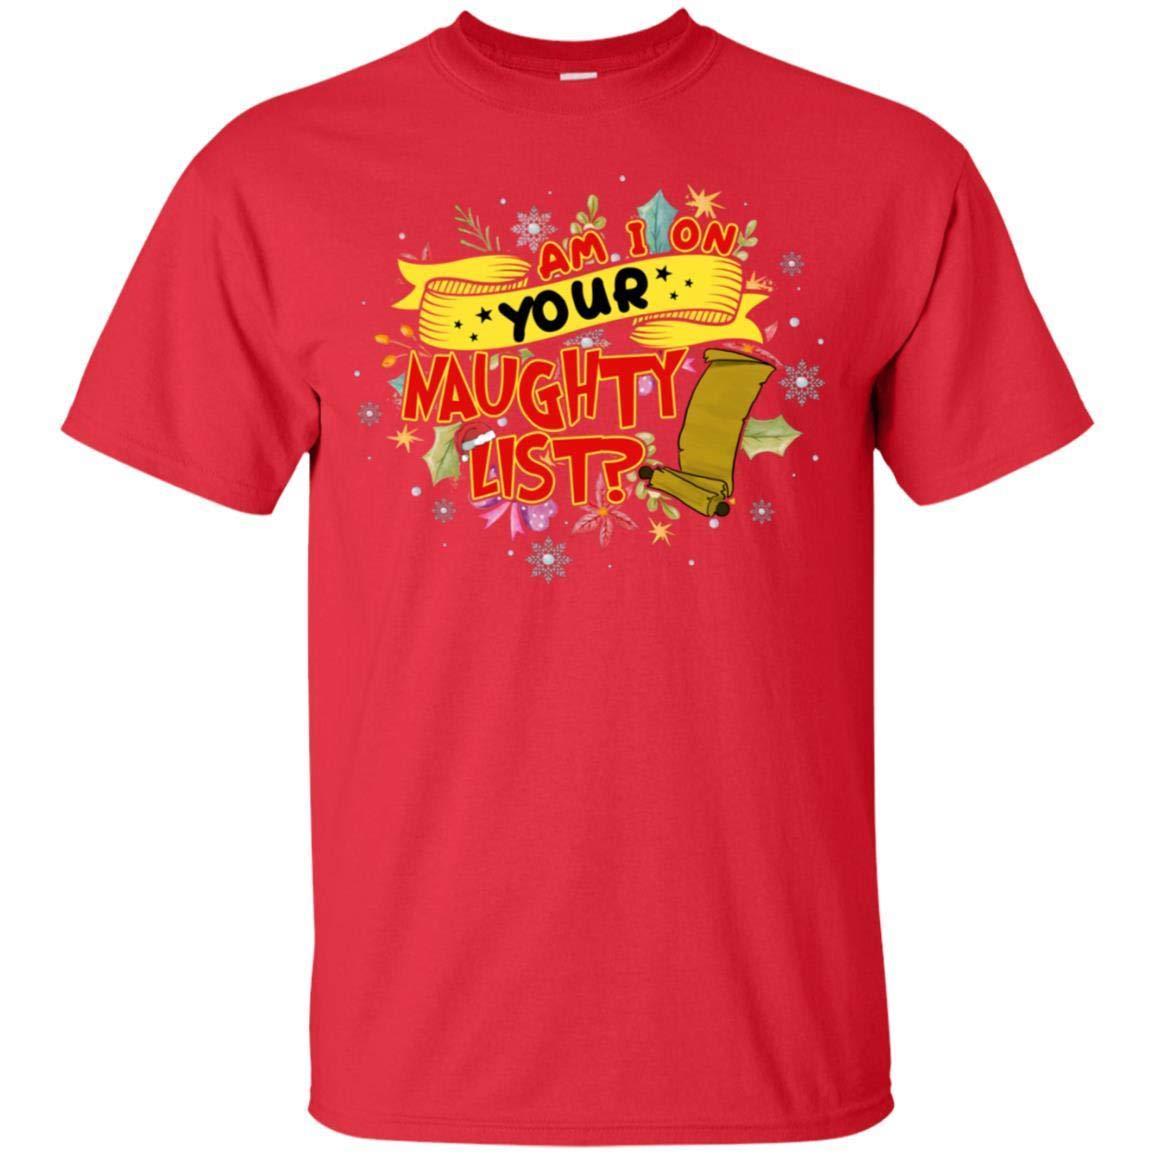 Teelesto Am I On Your Naughty List Funny X-mas Gift 2018 Shirt